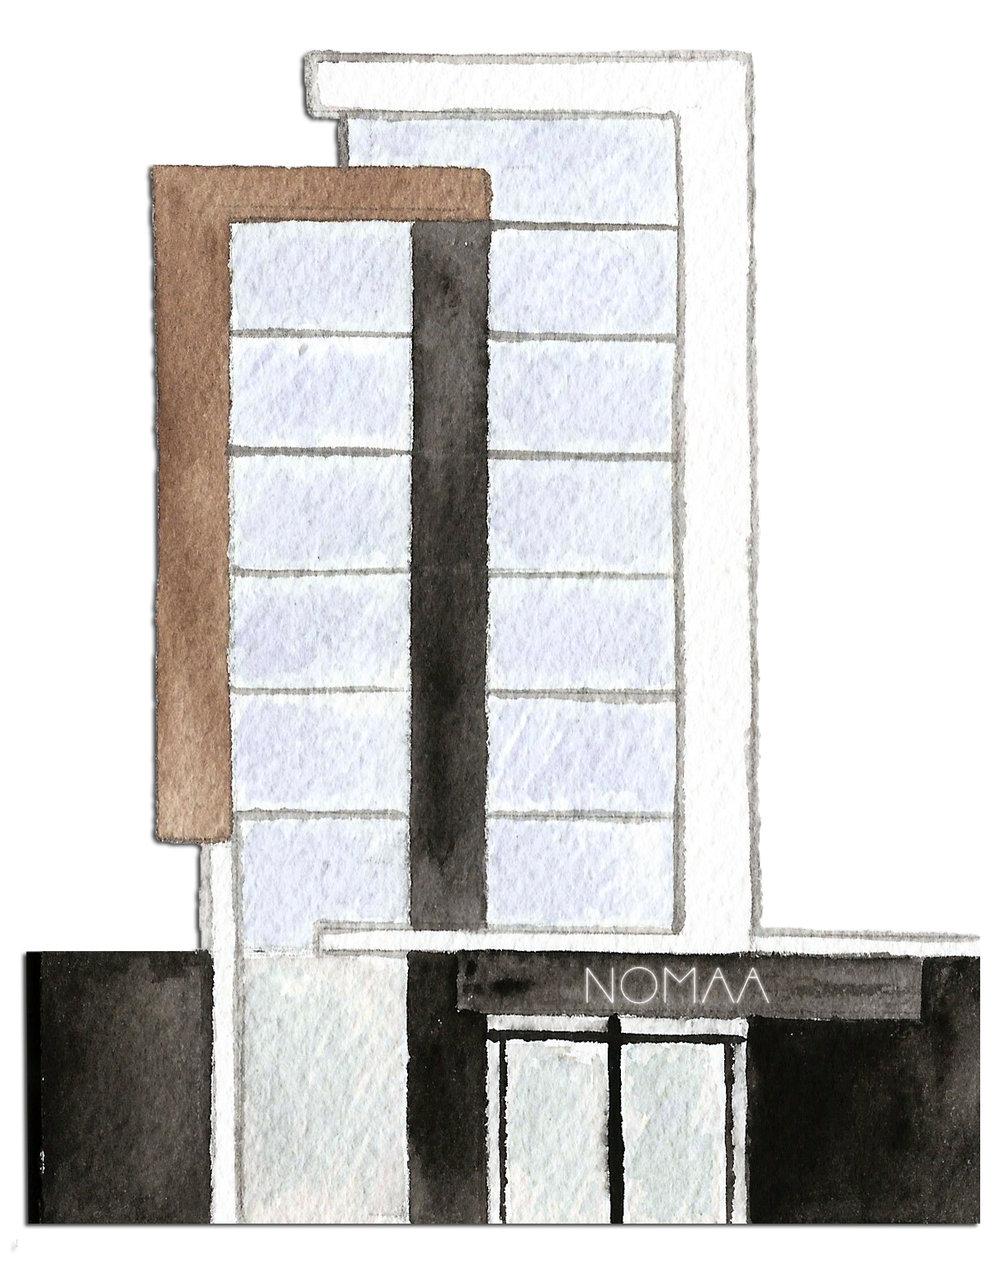 amaro-goes-to-curitiba-nomaa-hotel